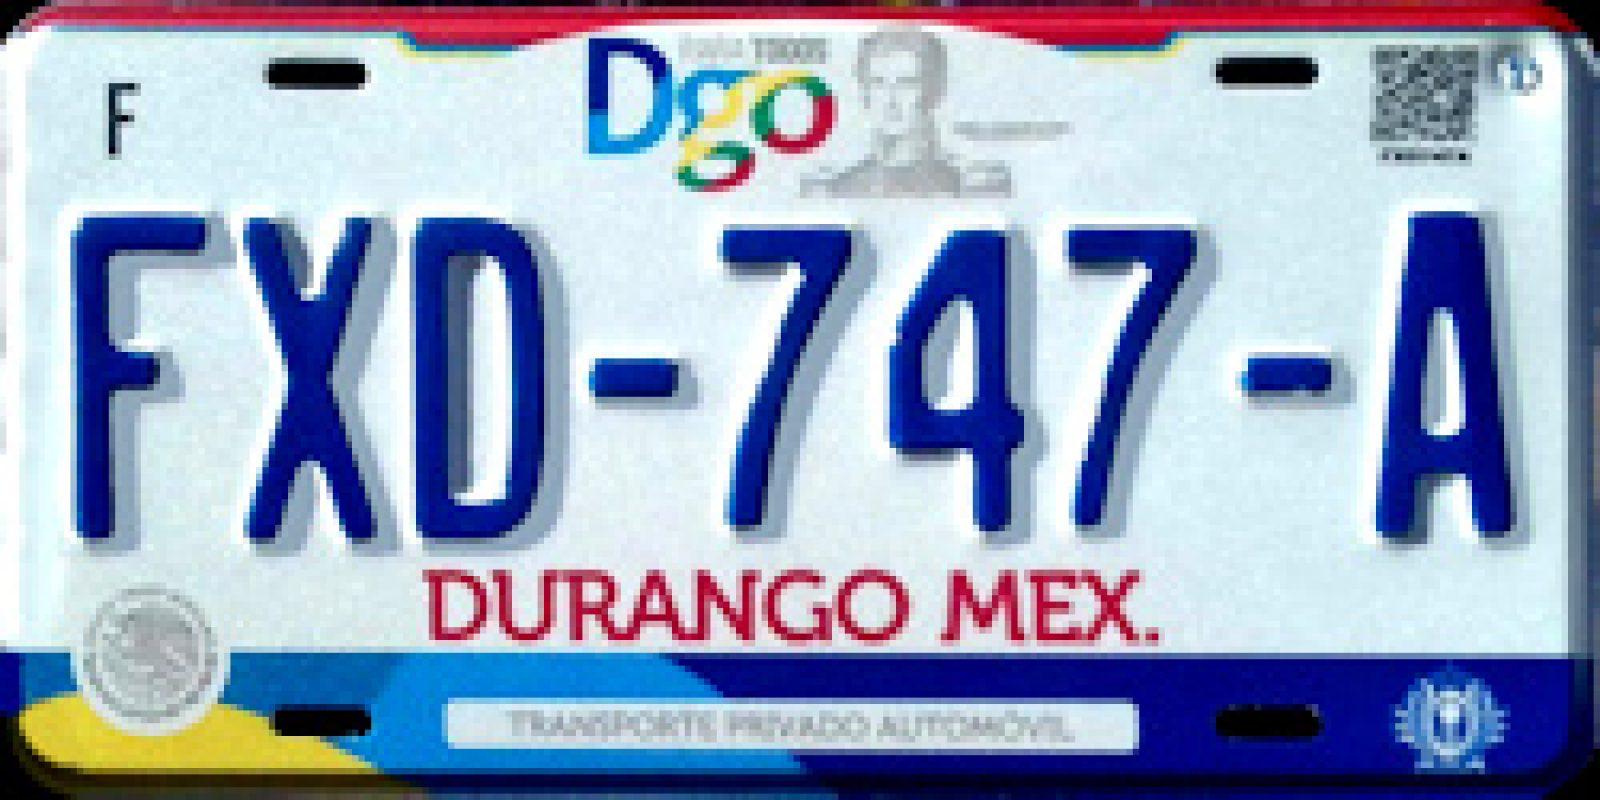 dgo2017. Imagen Por: Durango